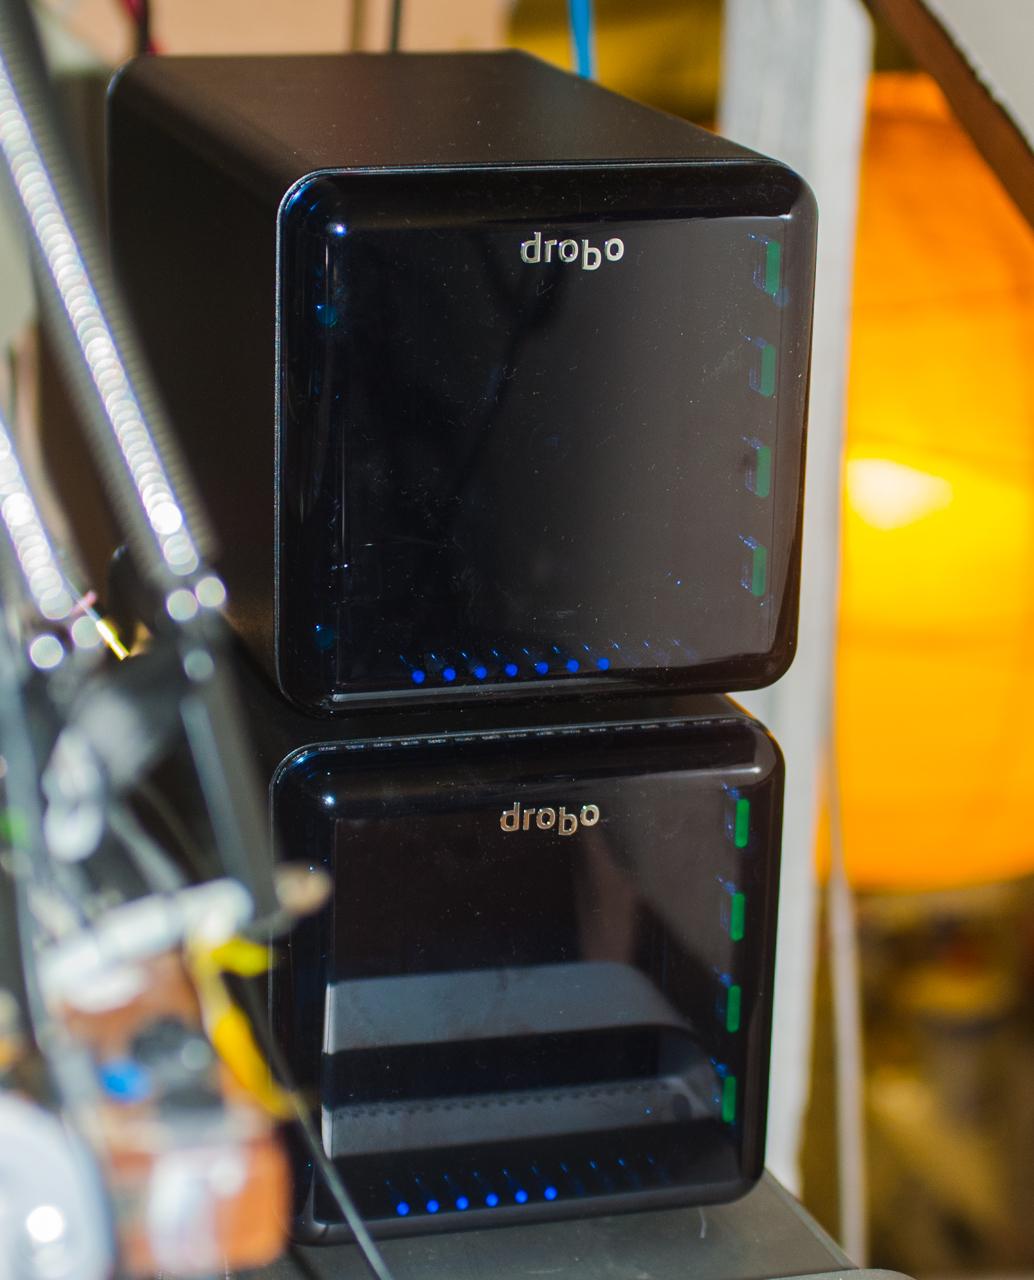 Double Drobo flash-2.jpg